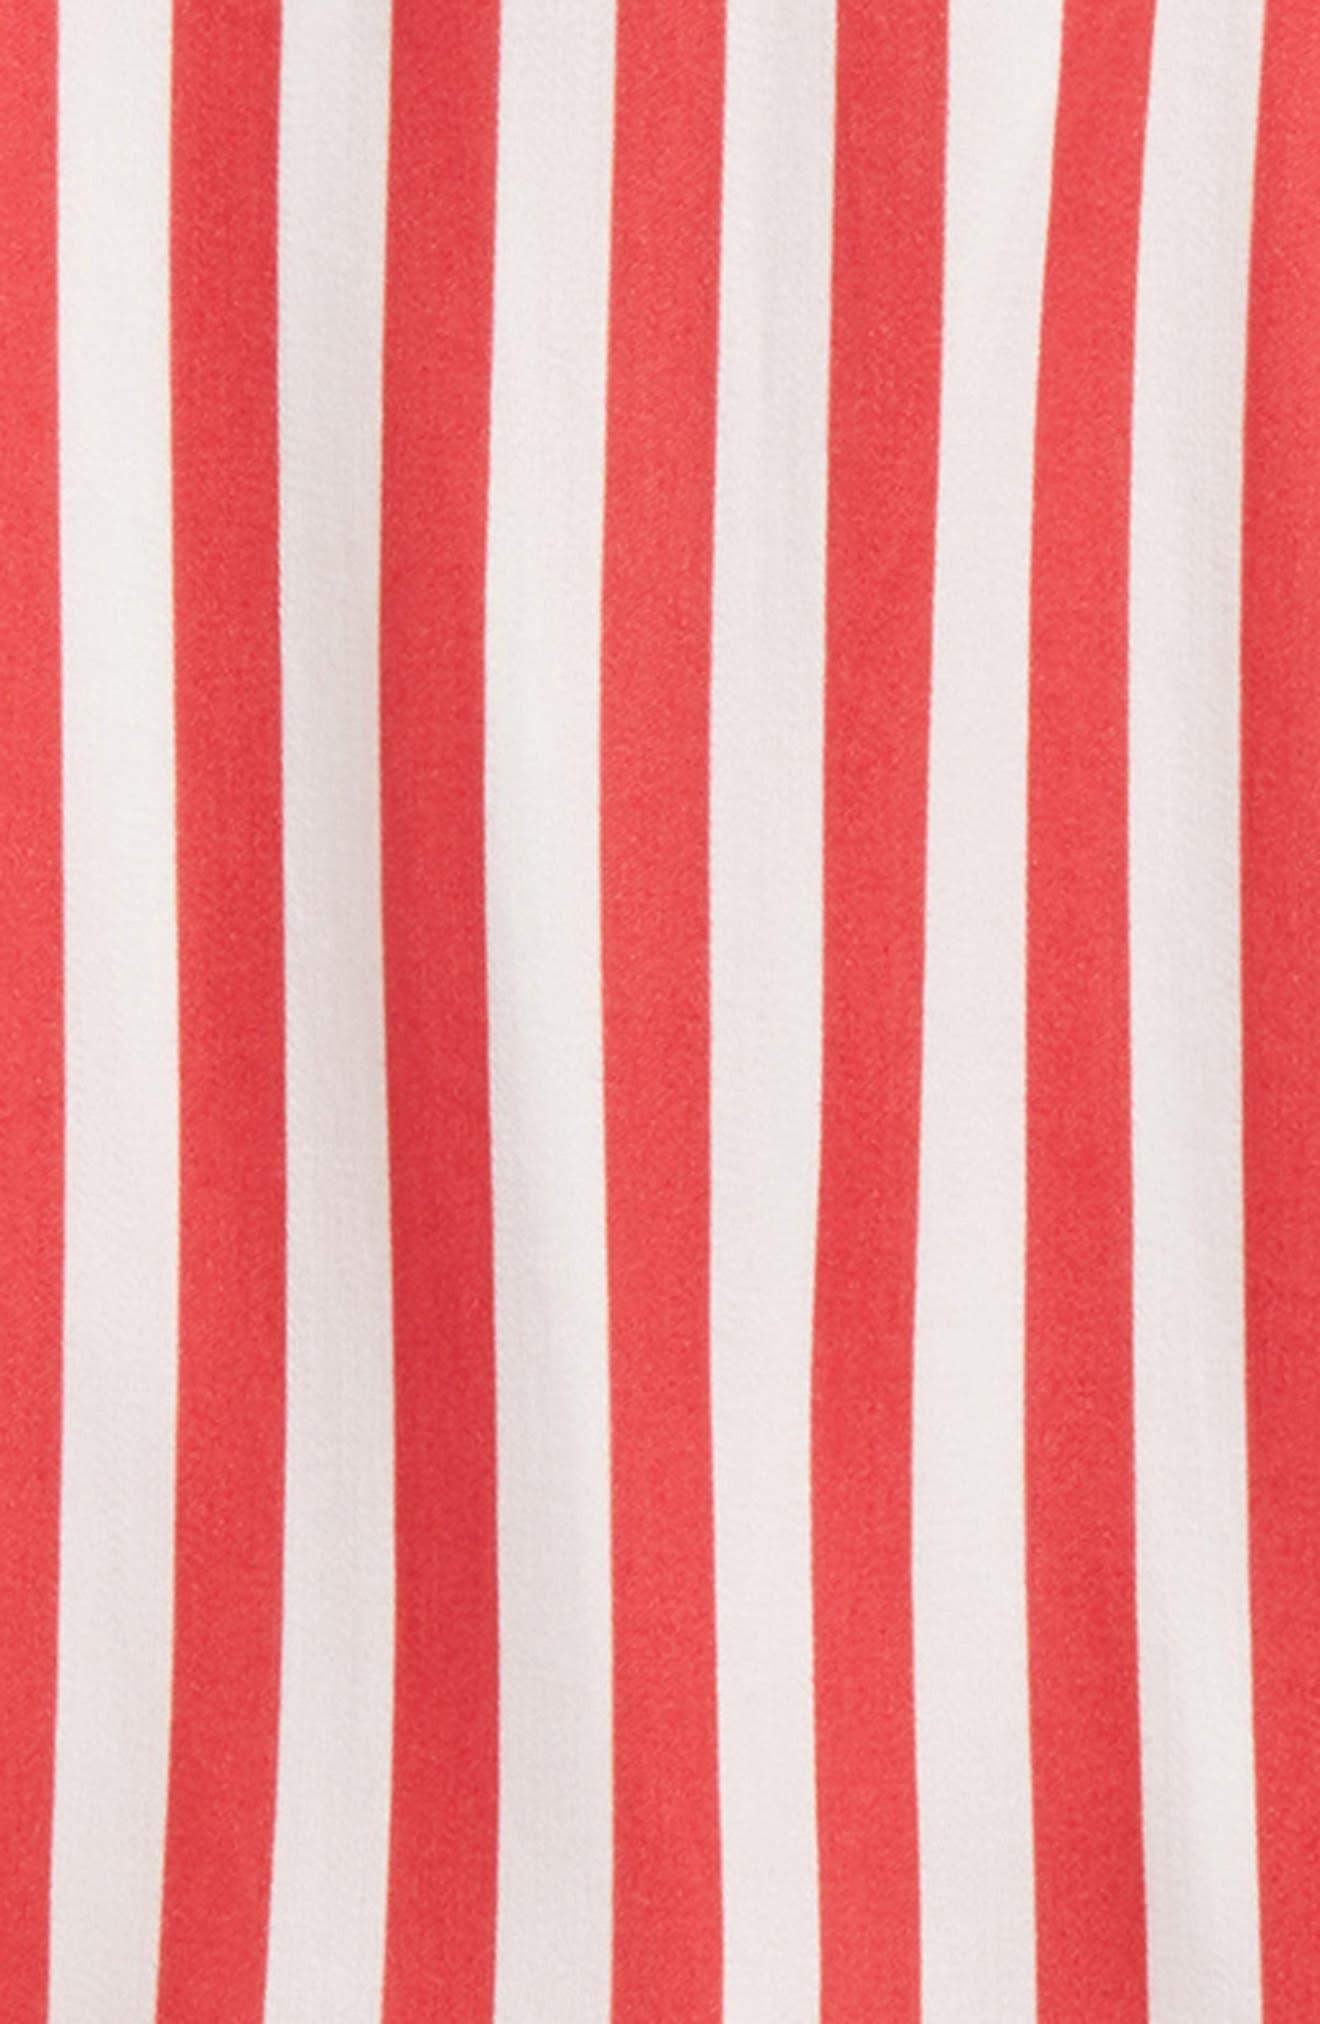 Eve Cold Shoulder Top,                             Alternate thumbnail 2, color,                             Lollipop Stripe